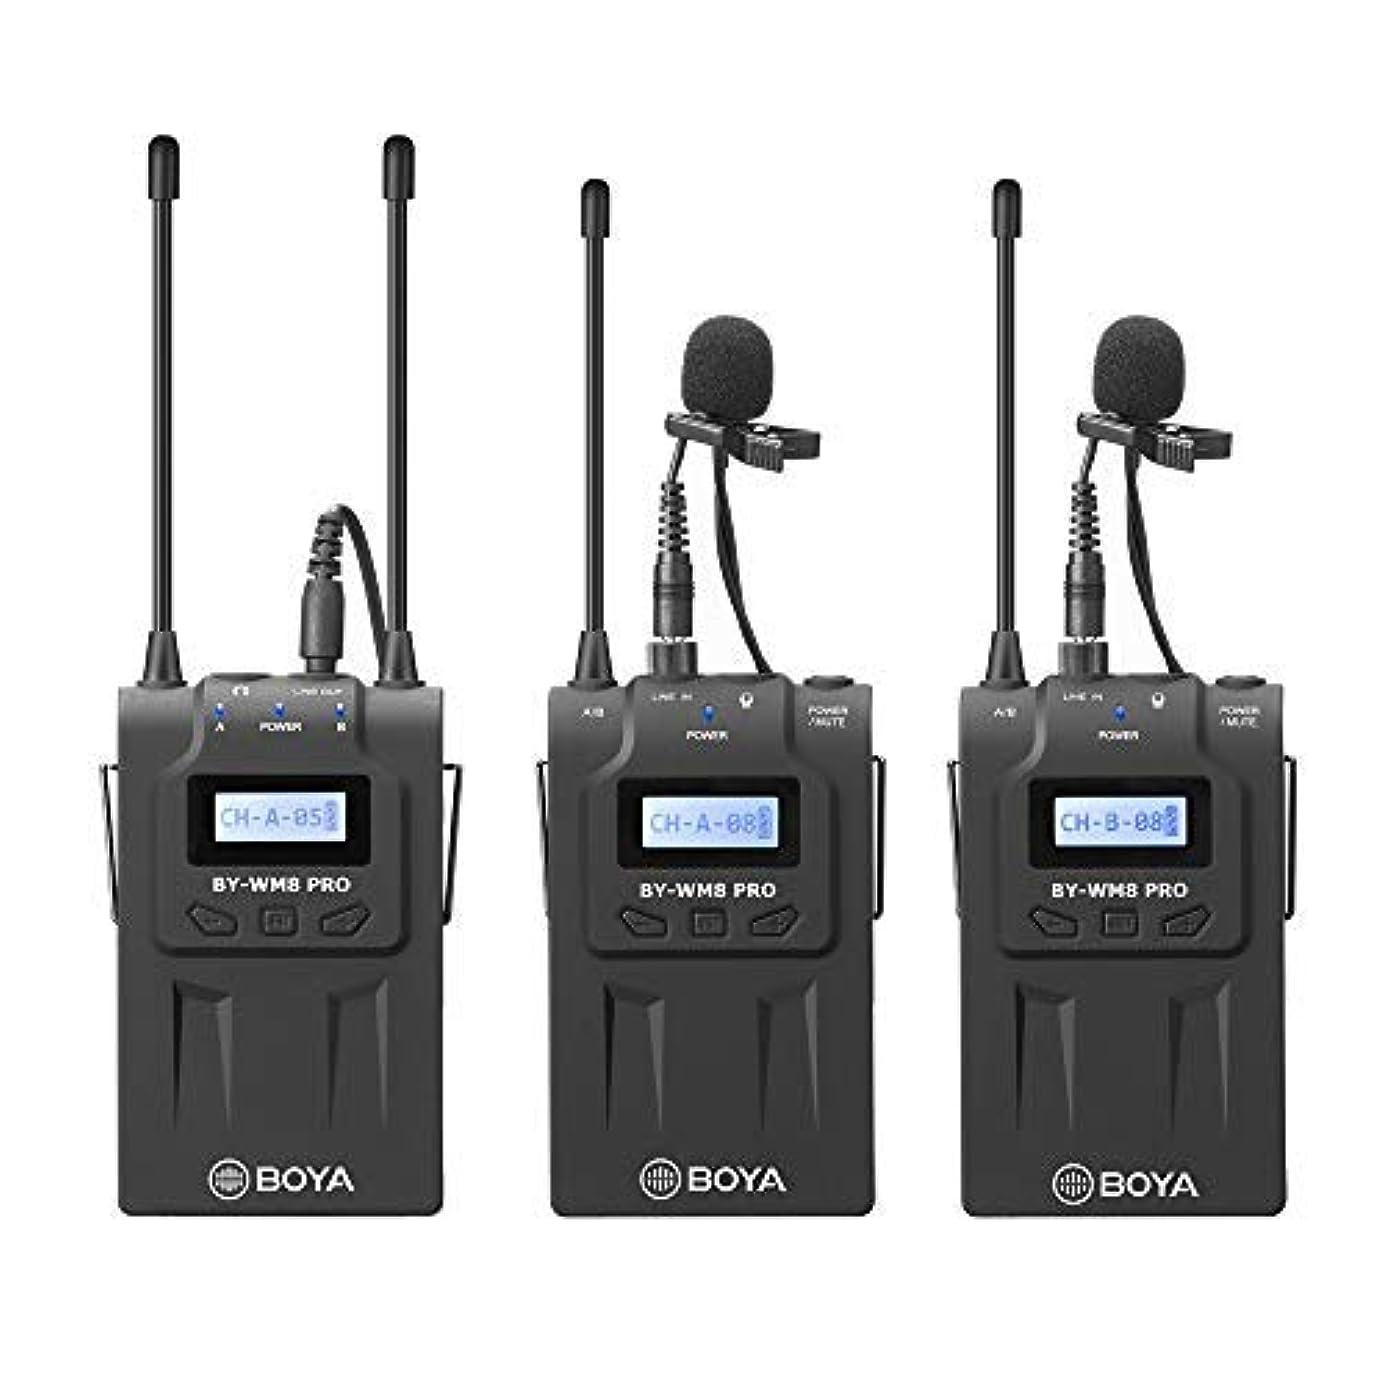 BOYA BY-WM8 PRO K2 UHF Wireless Microphone System 2 Transmitter 1 Receiver Sound Transducer for DSLR Camera Canon Nikon Panasonic Sony ENG Broadcast Recording agf5706904